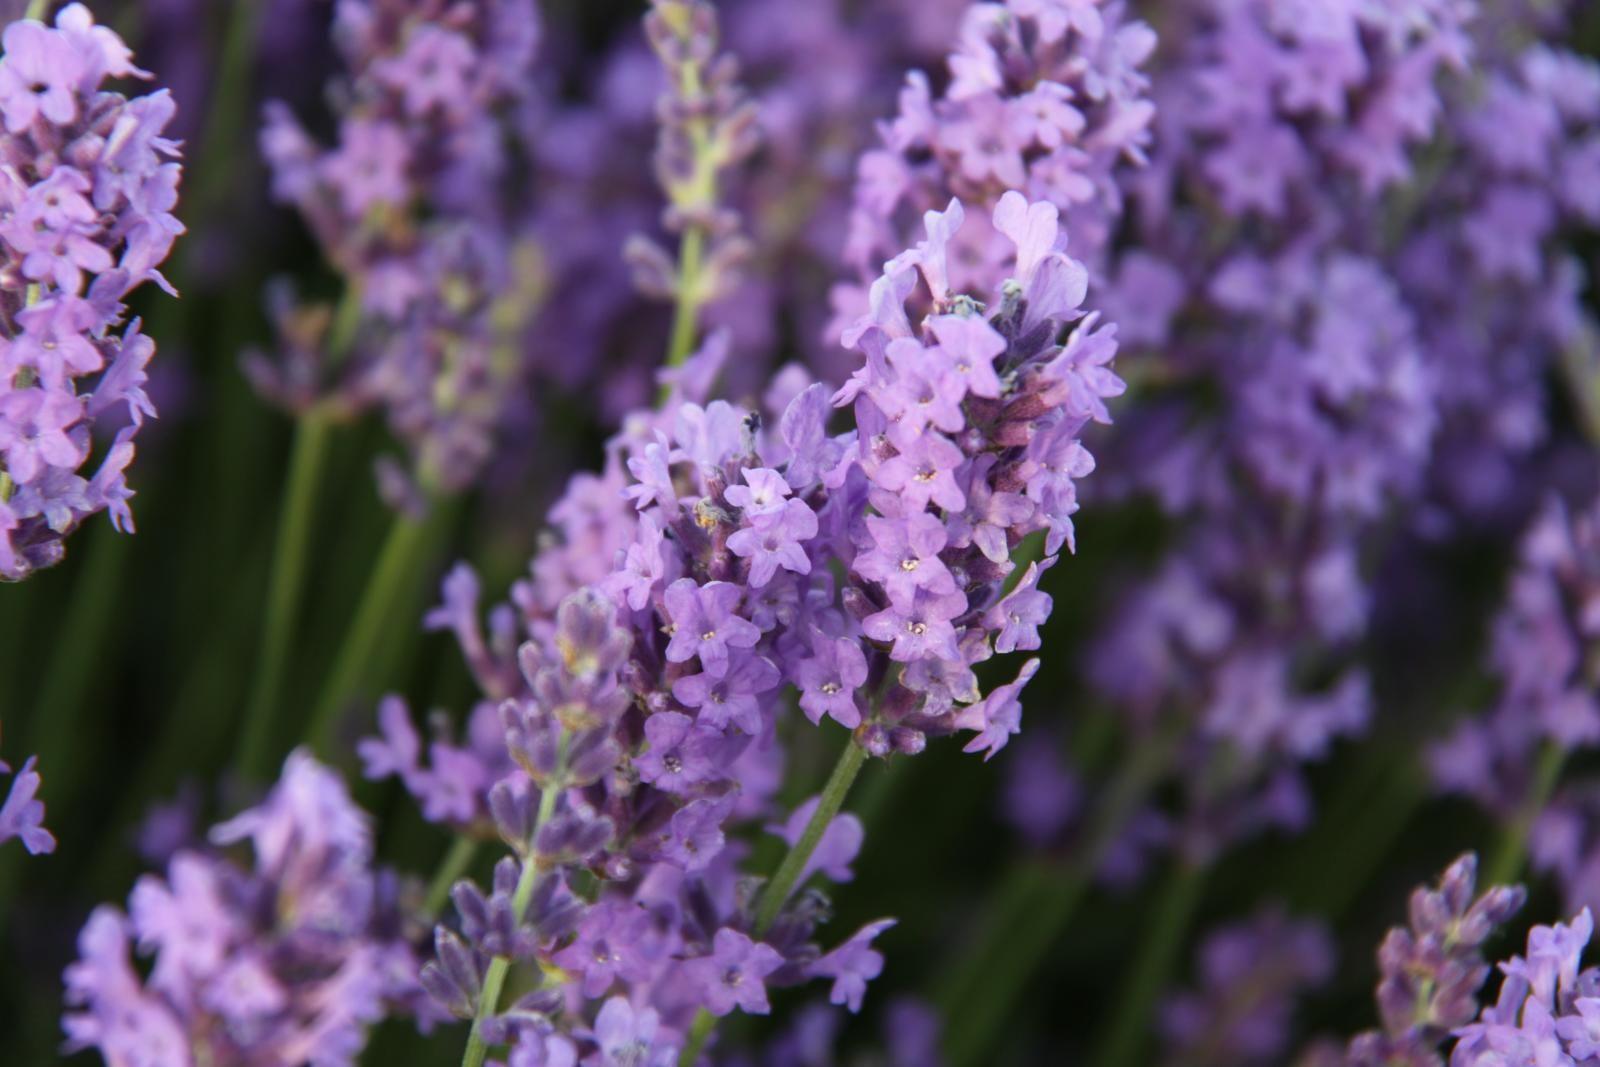 Lavender Insect Repellent Recipe Mosquito repelling